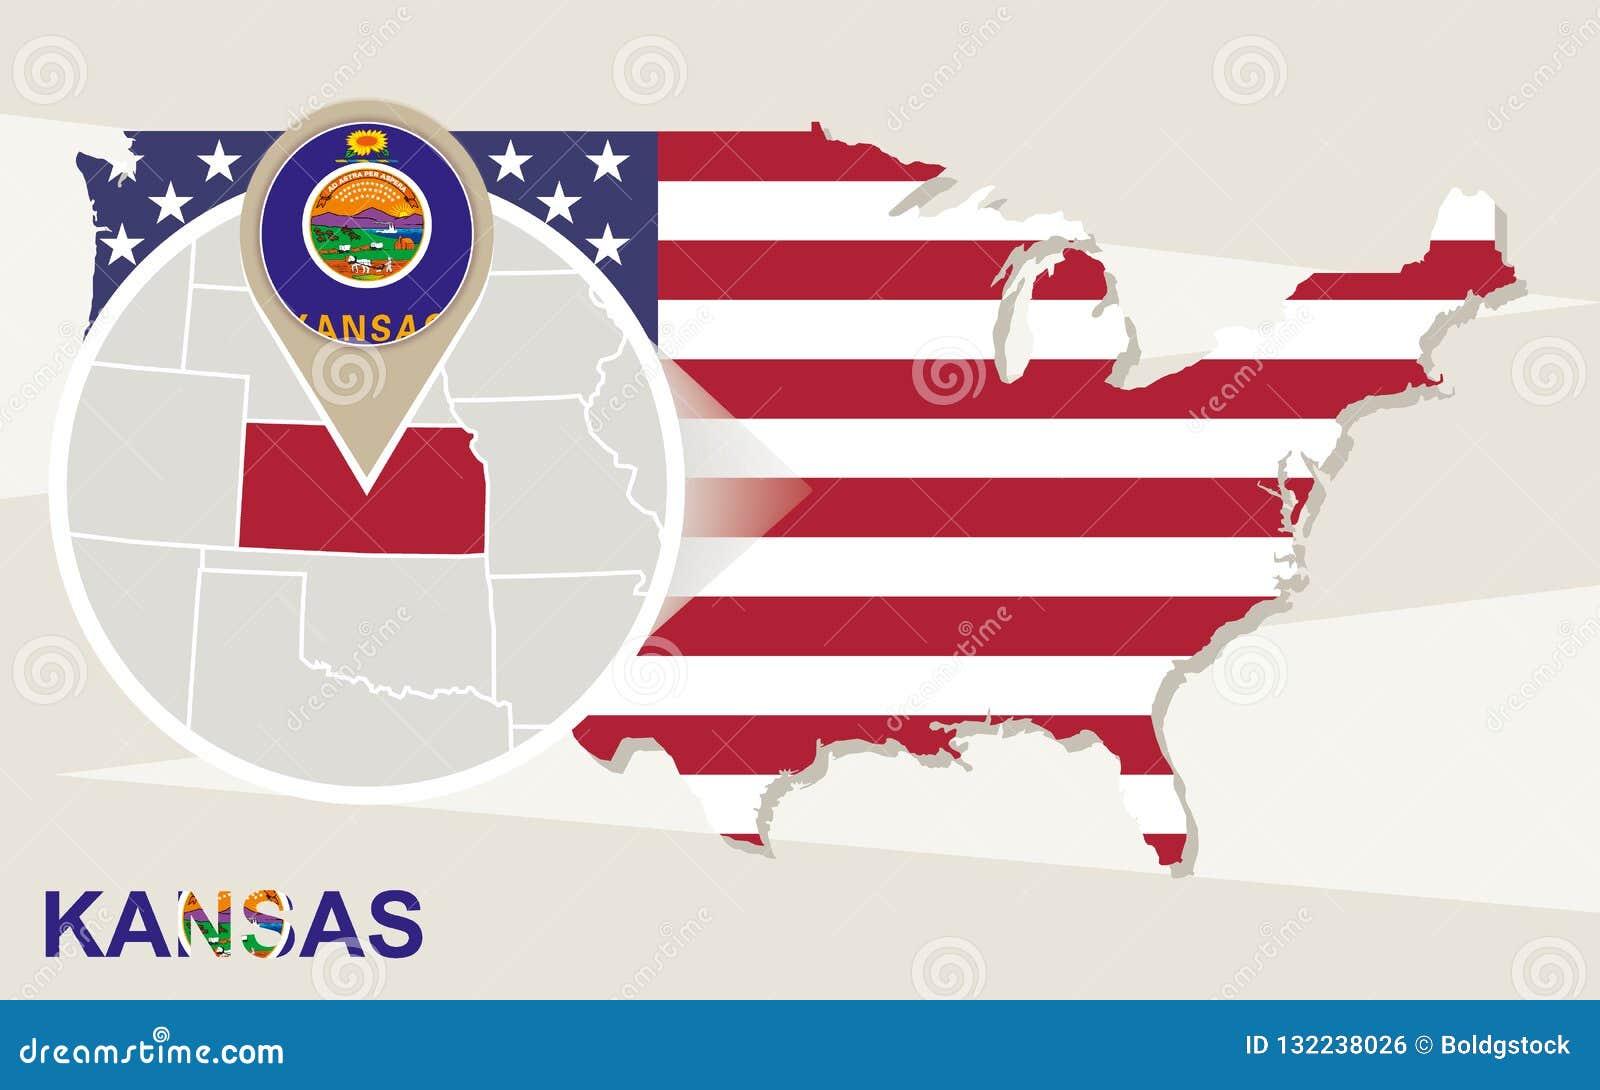 Usa Map With Magnified Kansas State Kansas Flag And Map Stock